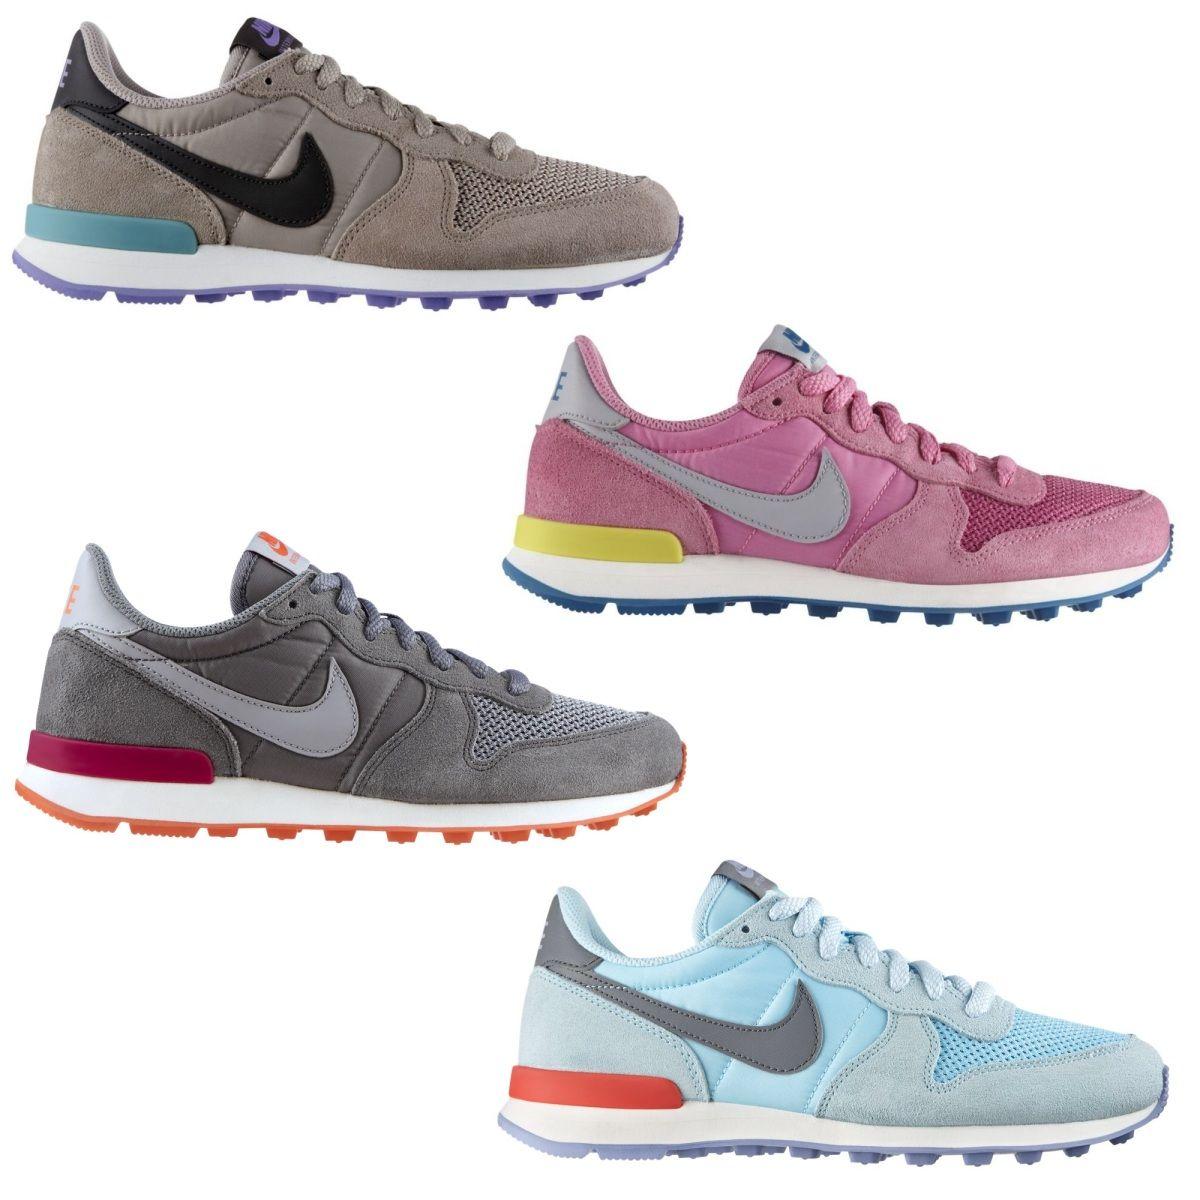 Delegar Mathis Mediana  Nike Internationalist Damen Schuhe Turnschuhe ... damen nike sneaker  internationalist sneakers schuhe turnschuhe wildleder frei… in 2020 |  Sneakers, Sneakers nike, Nike